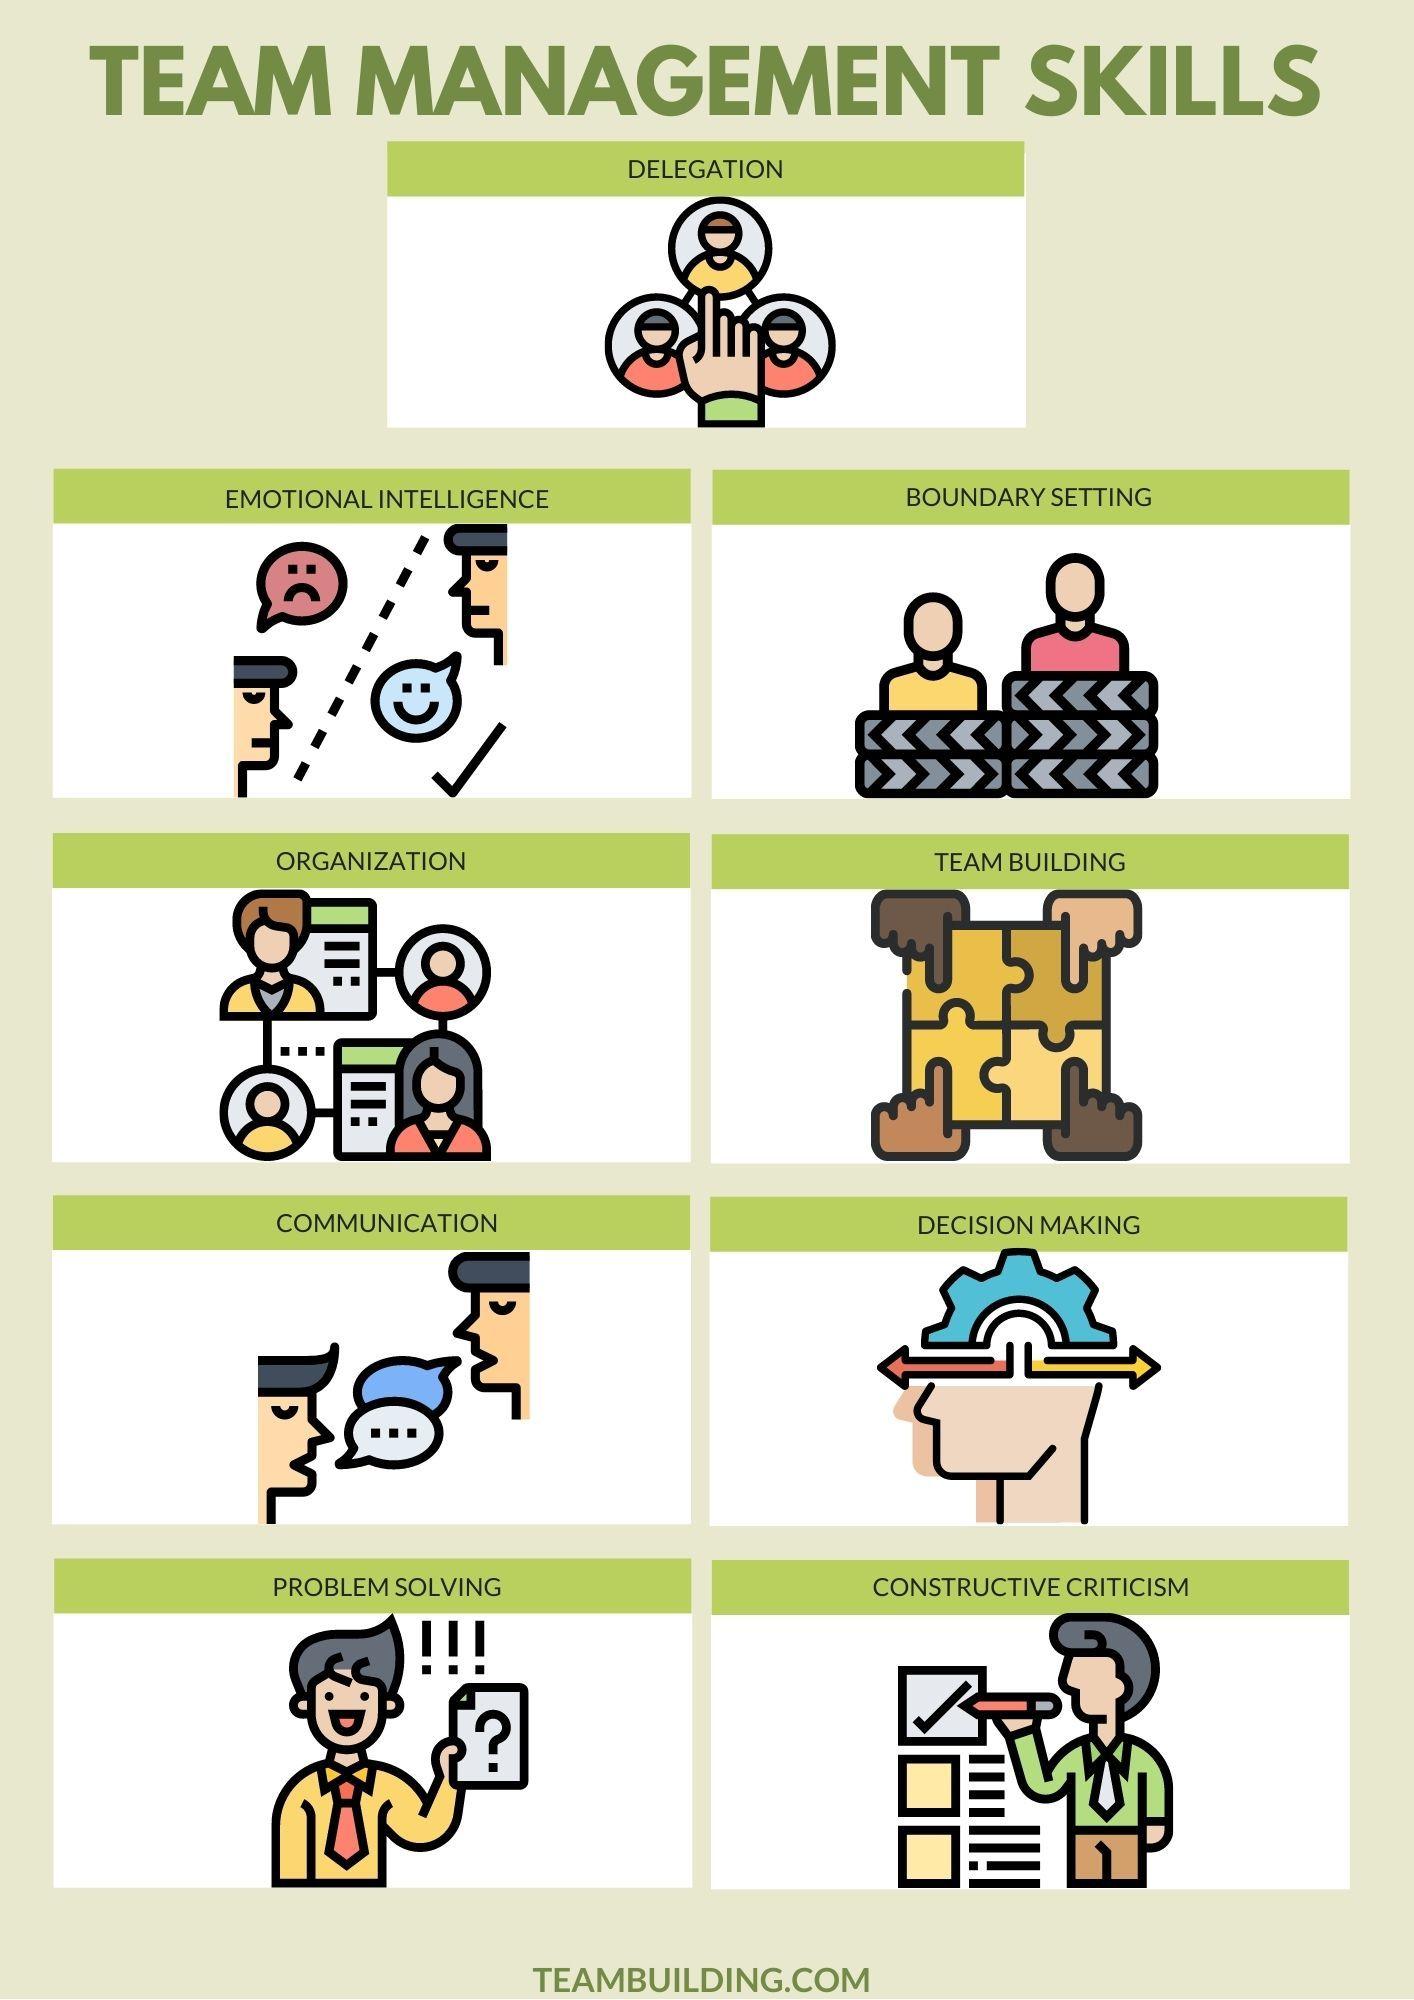 Team management skills infographic